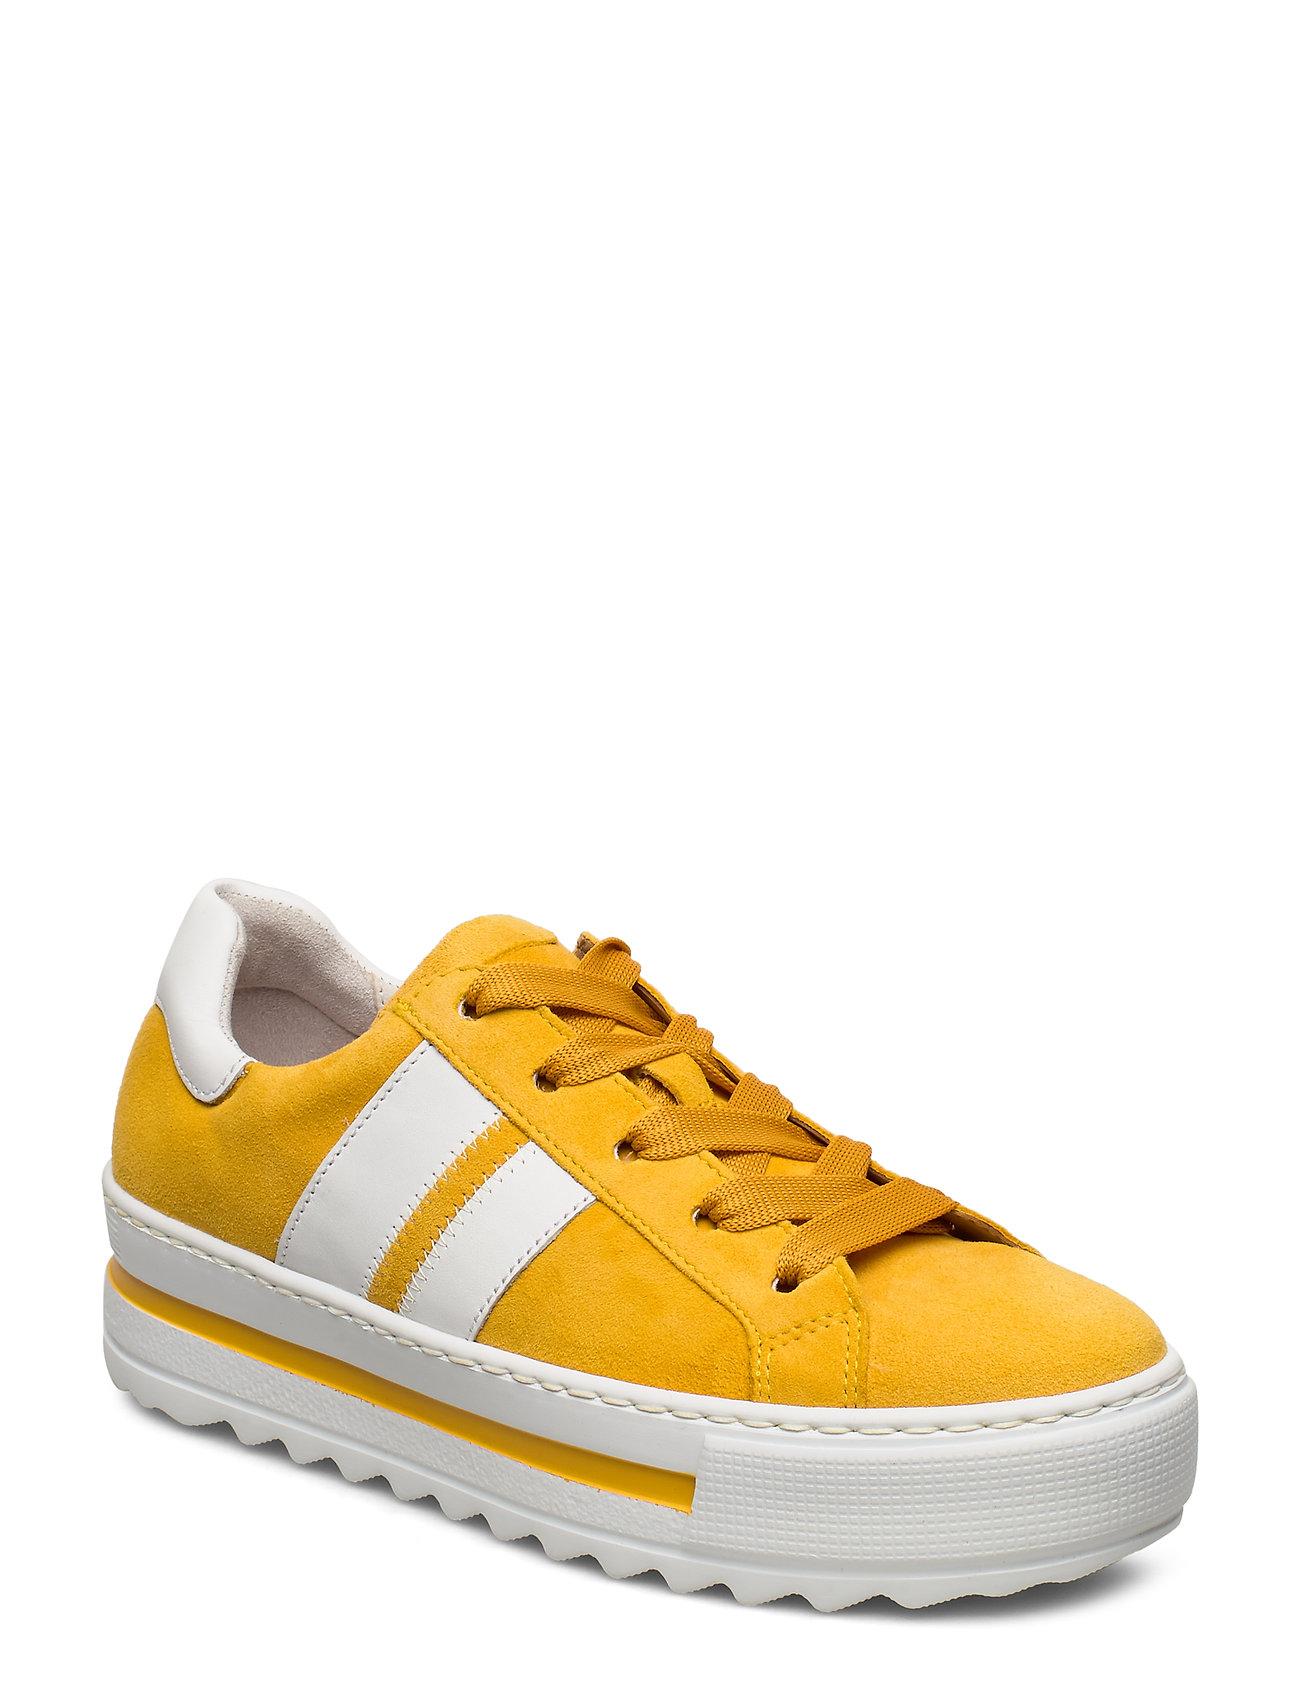 Image of Sneaker Low-top Sneakers Gul Gabor (3345964131)